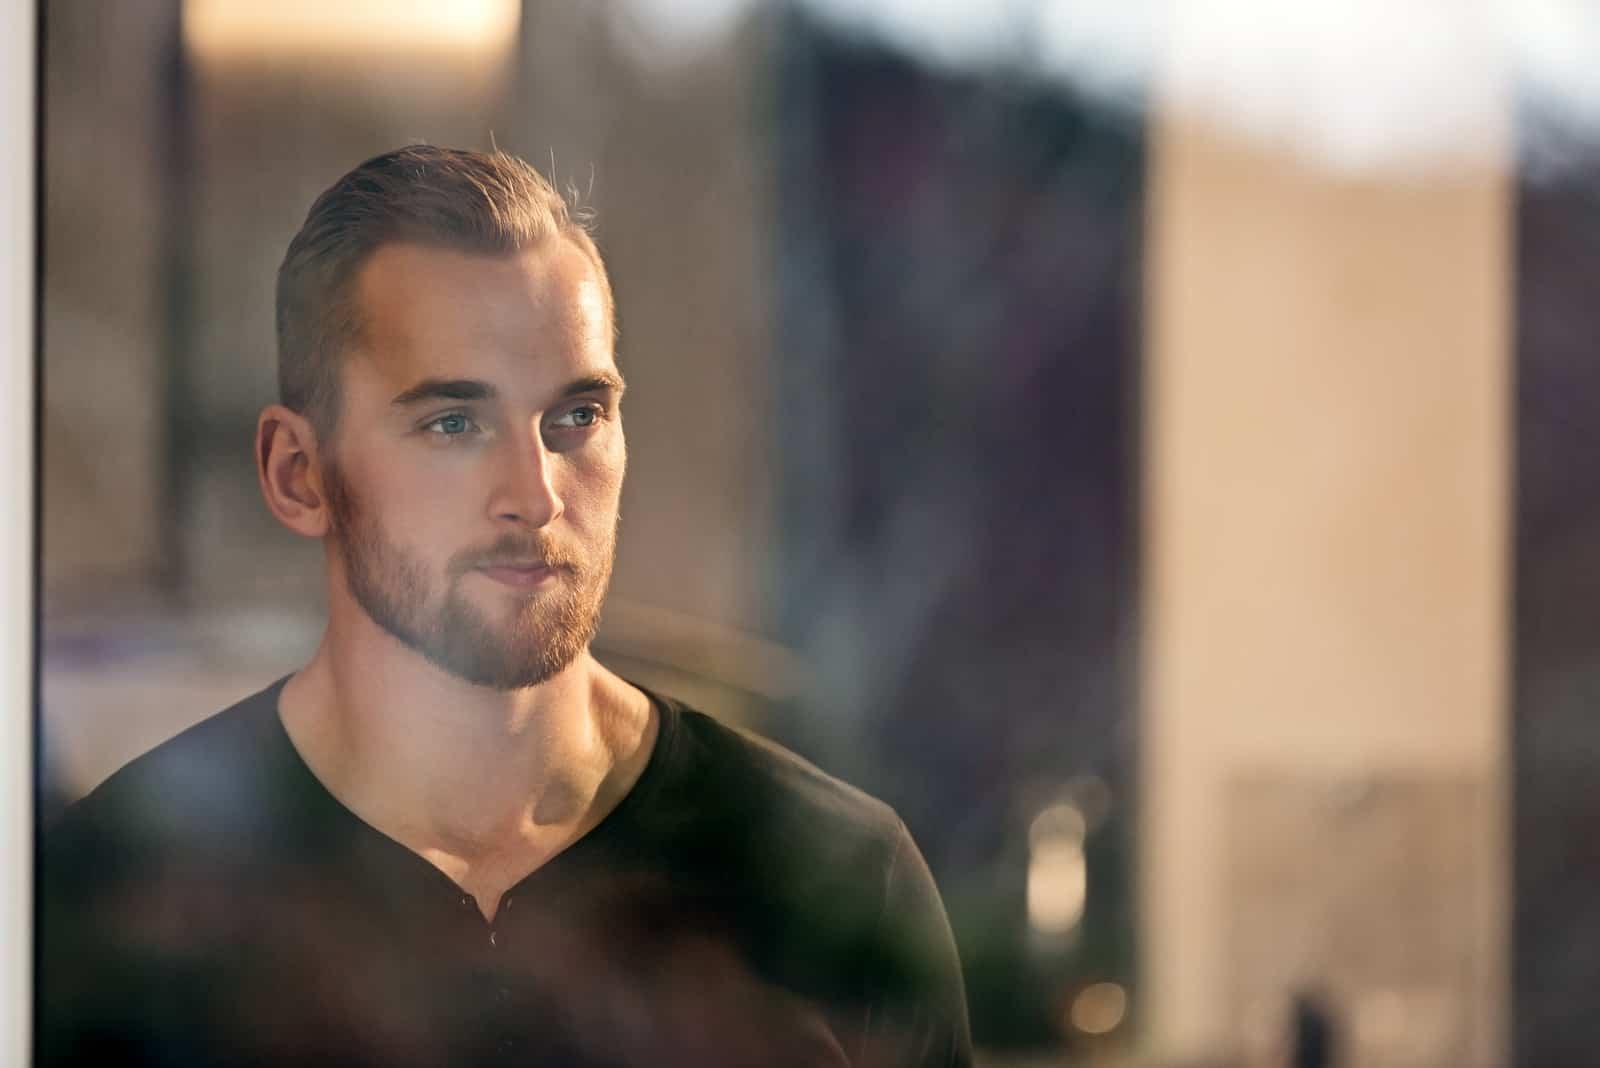 man wearing a black long sleeved shirt